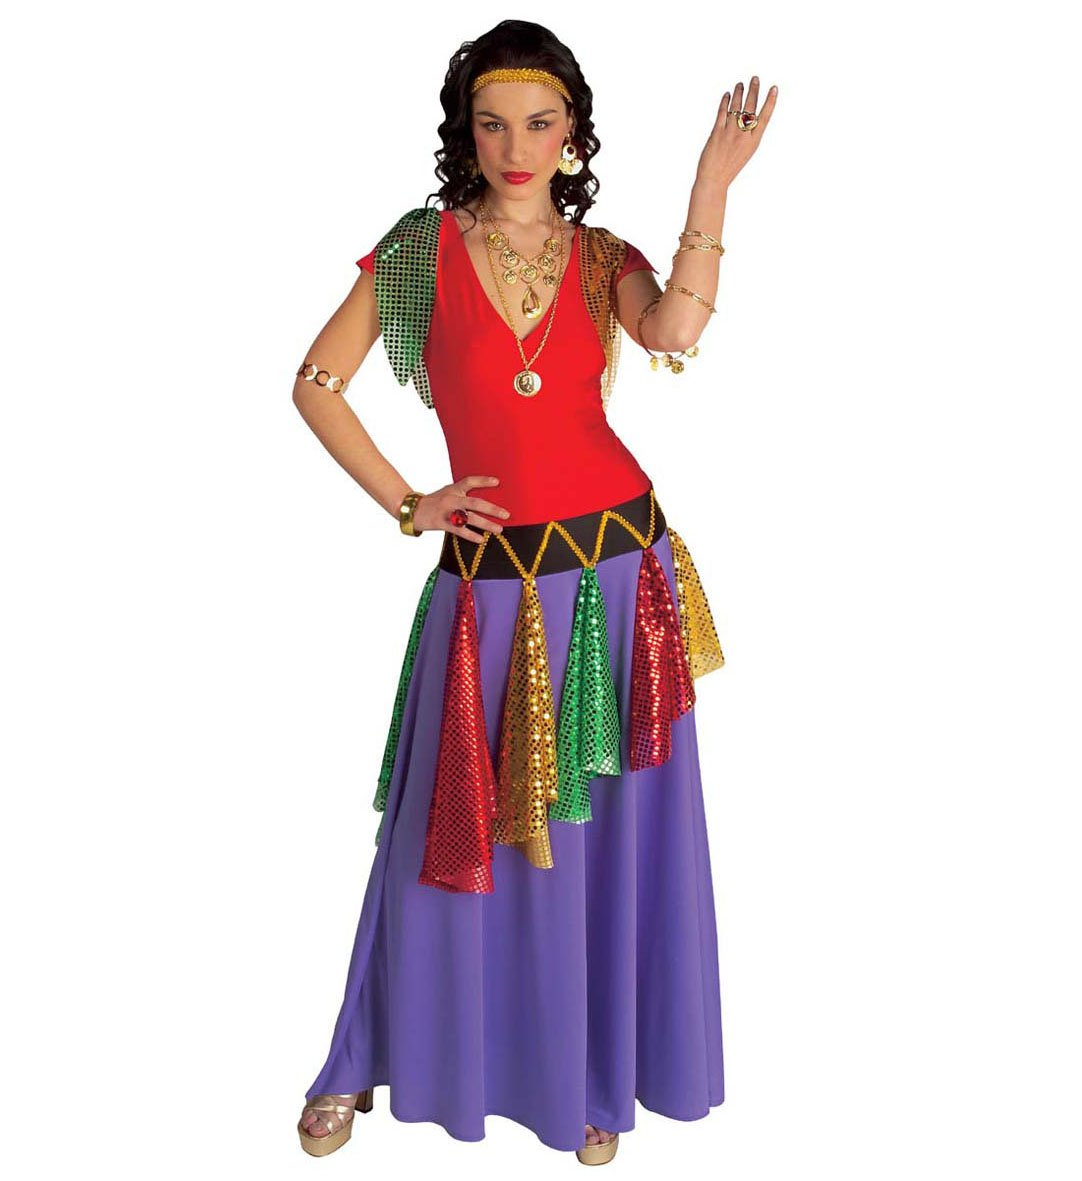 WIDMANN Desconocido Disfraz de Reina Gitana: Amazon.es: Juguetes y ...